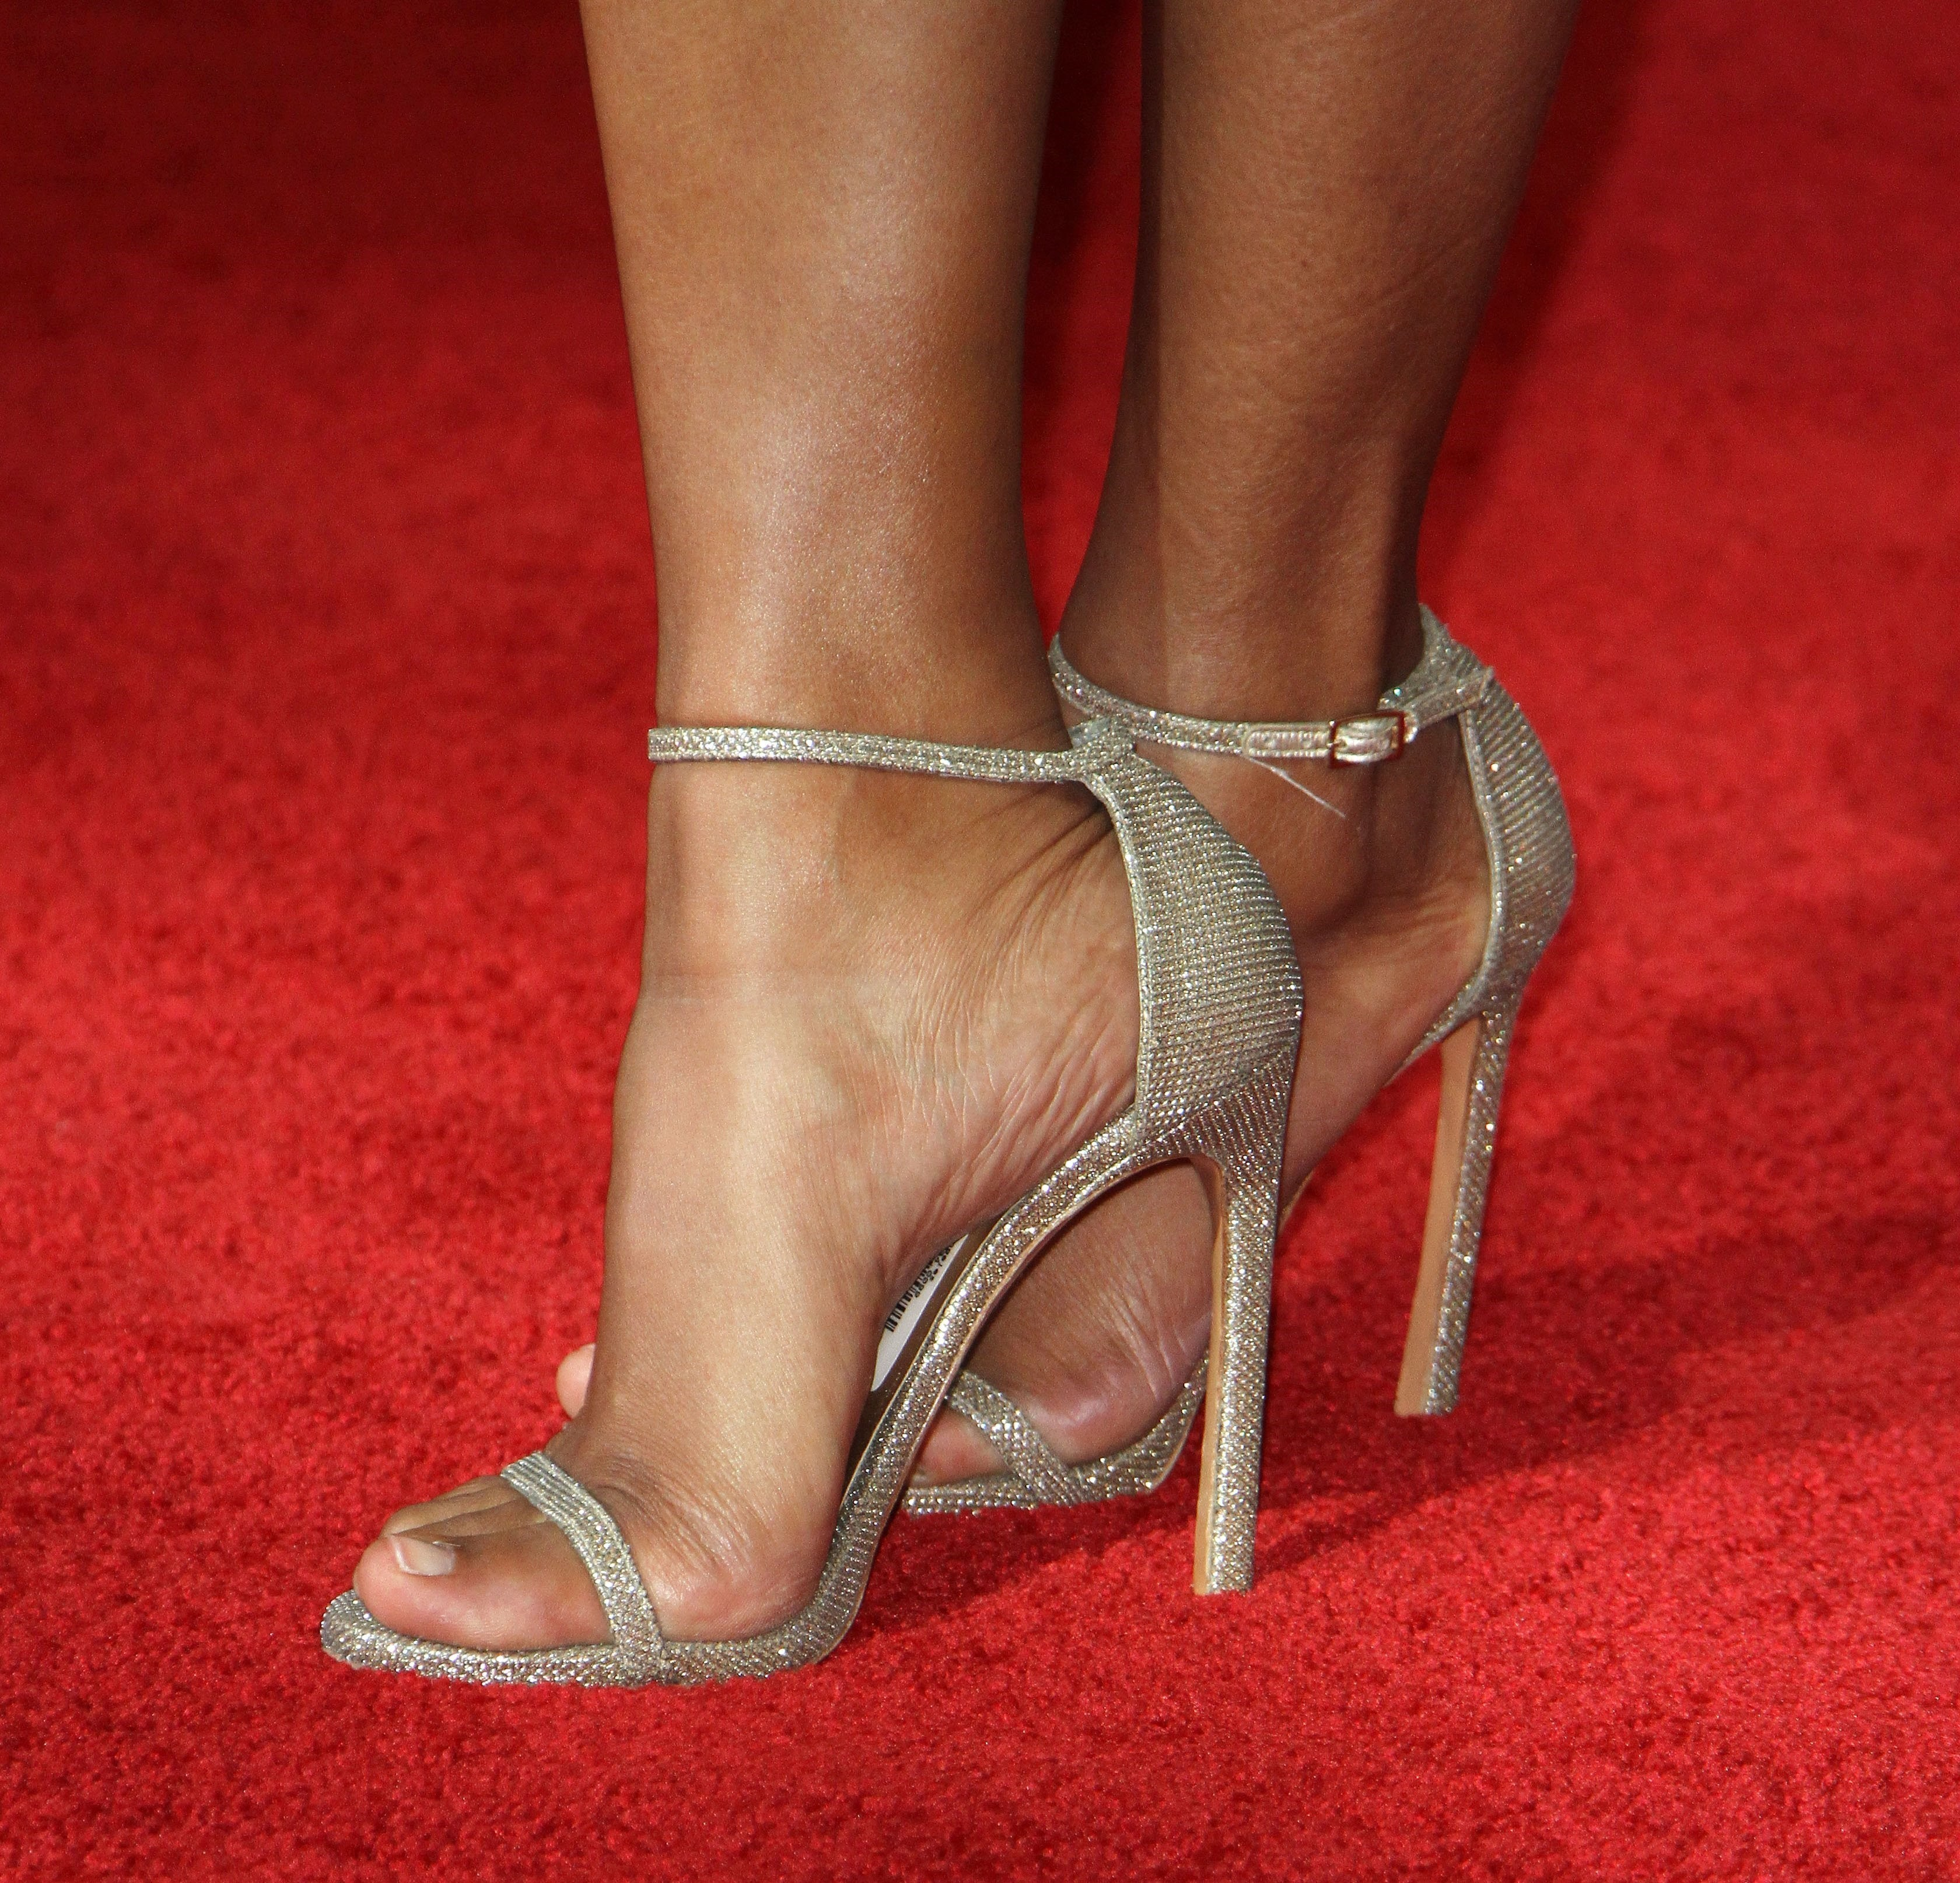 kerry washington feet